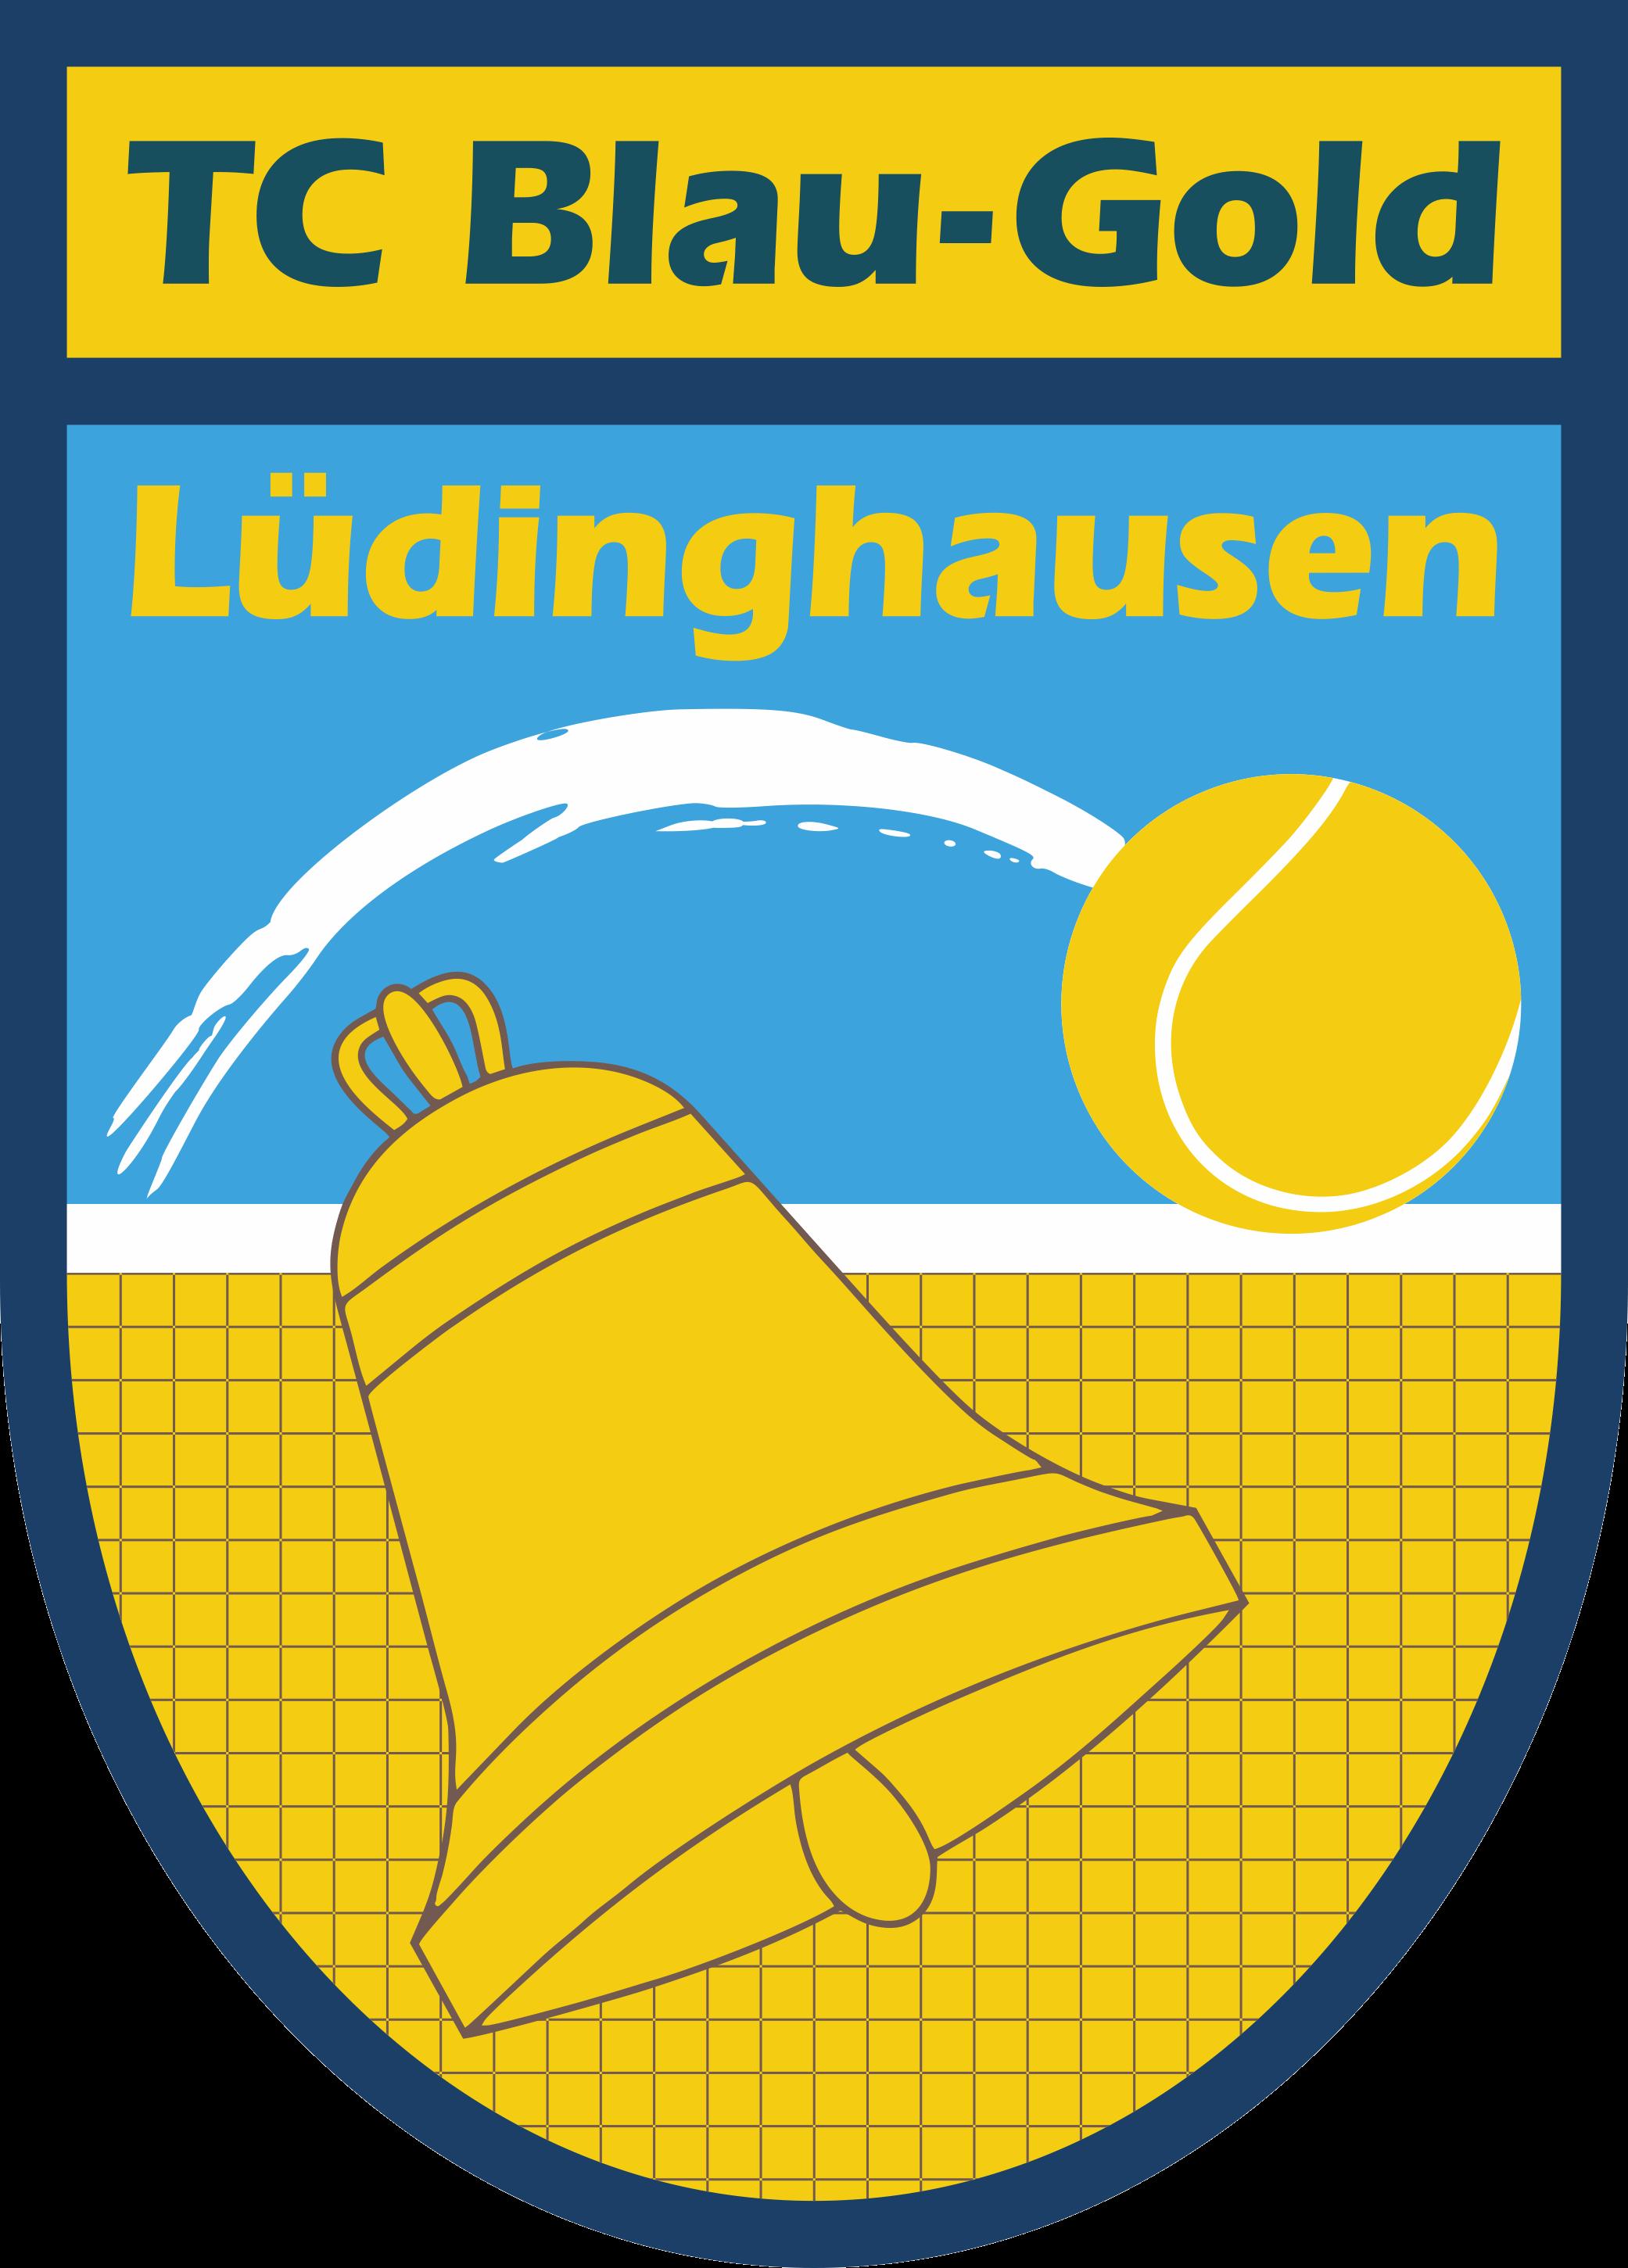 TC Blau-Gold Lüdinghausen